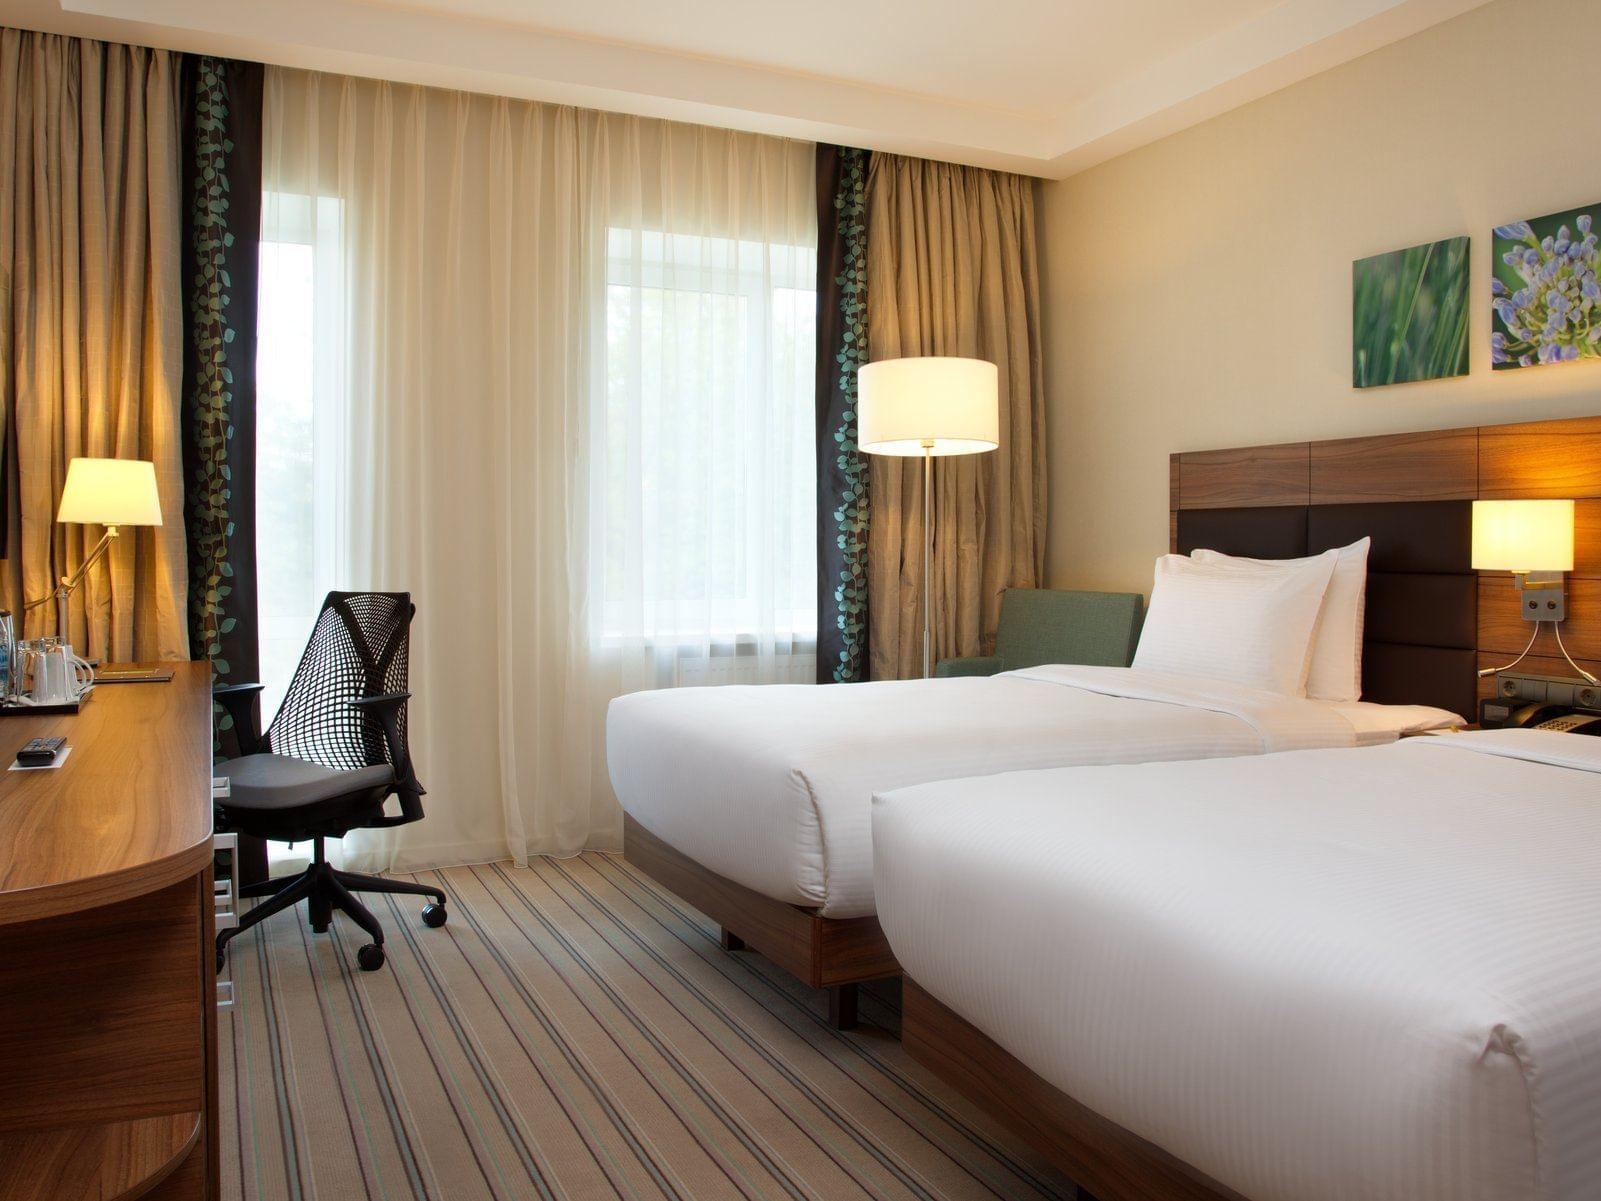 Twin Room at Hilton Garden Inn Moscow New Riga Hotel